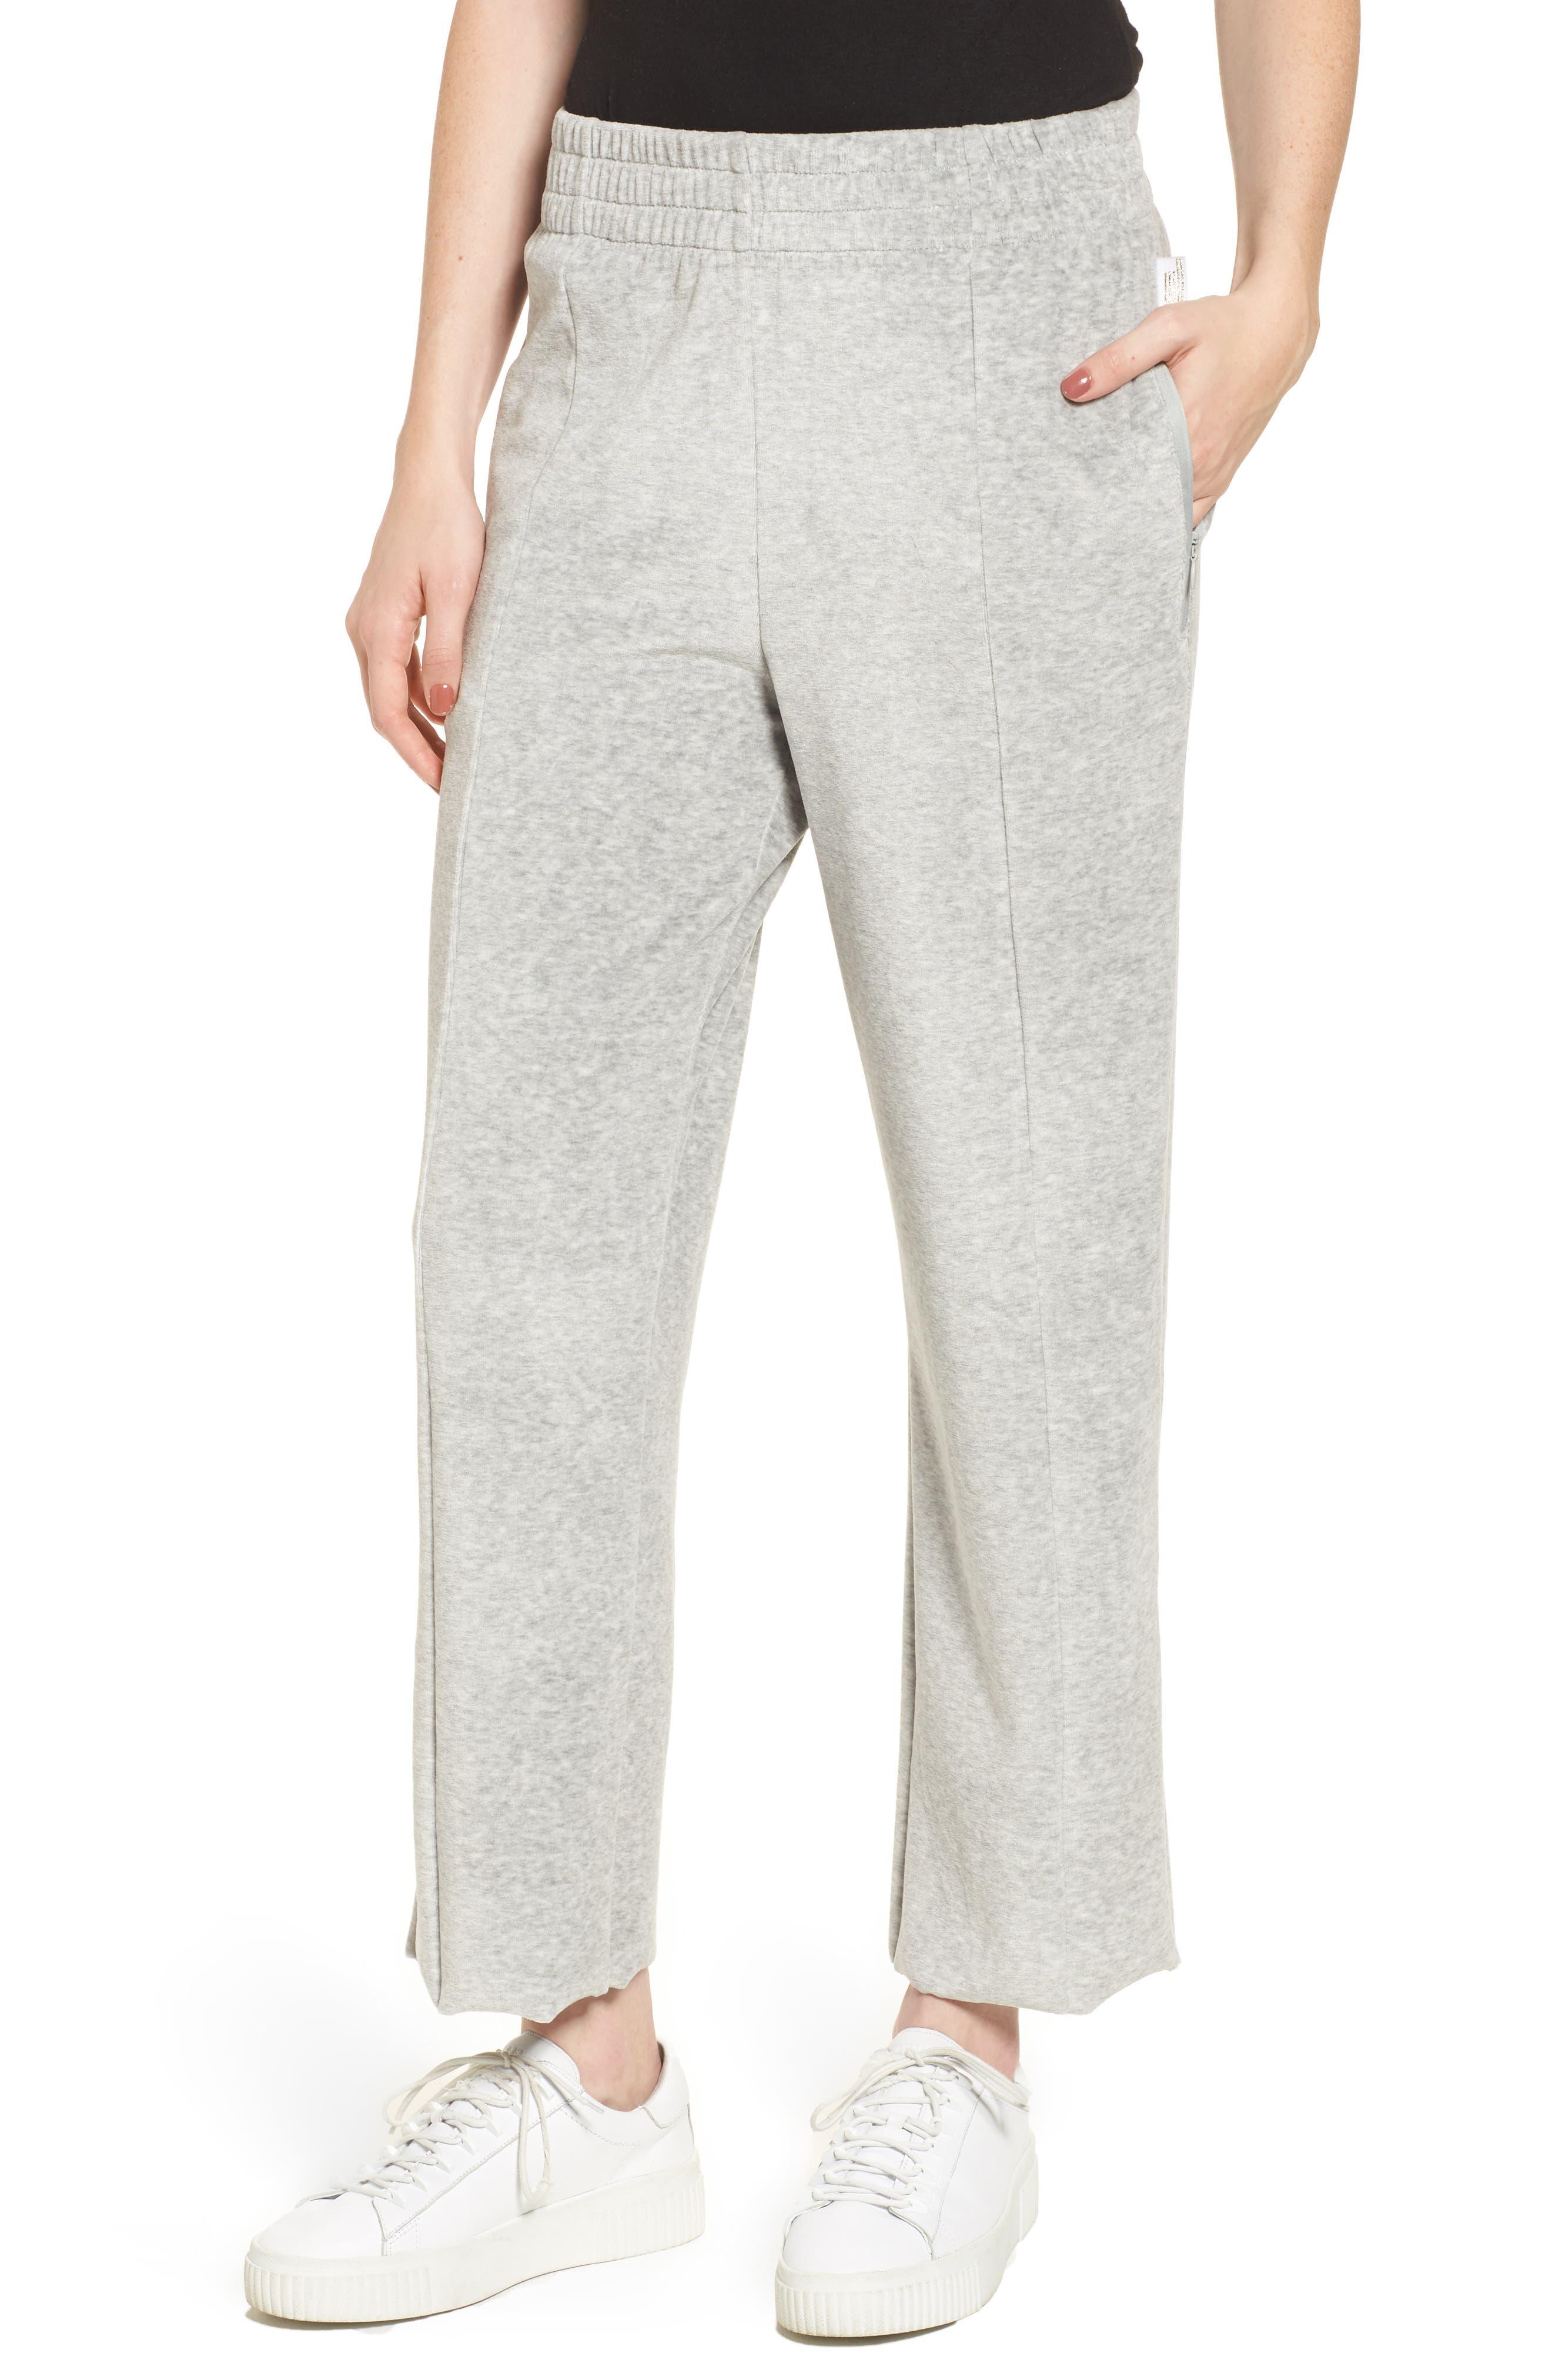 Main Image - Good American Good Sweats The High Waist Sweatpants (Regular & Plus Size)